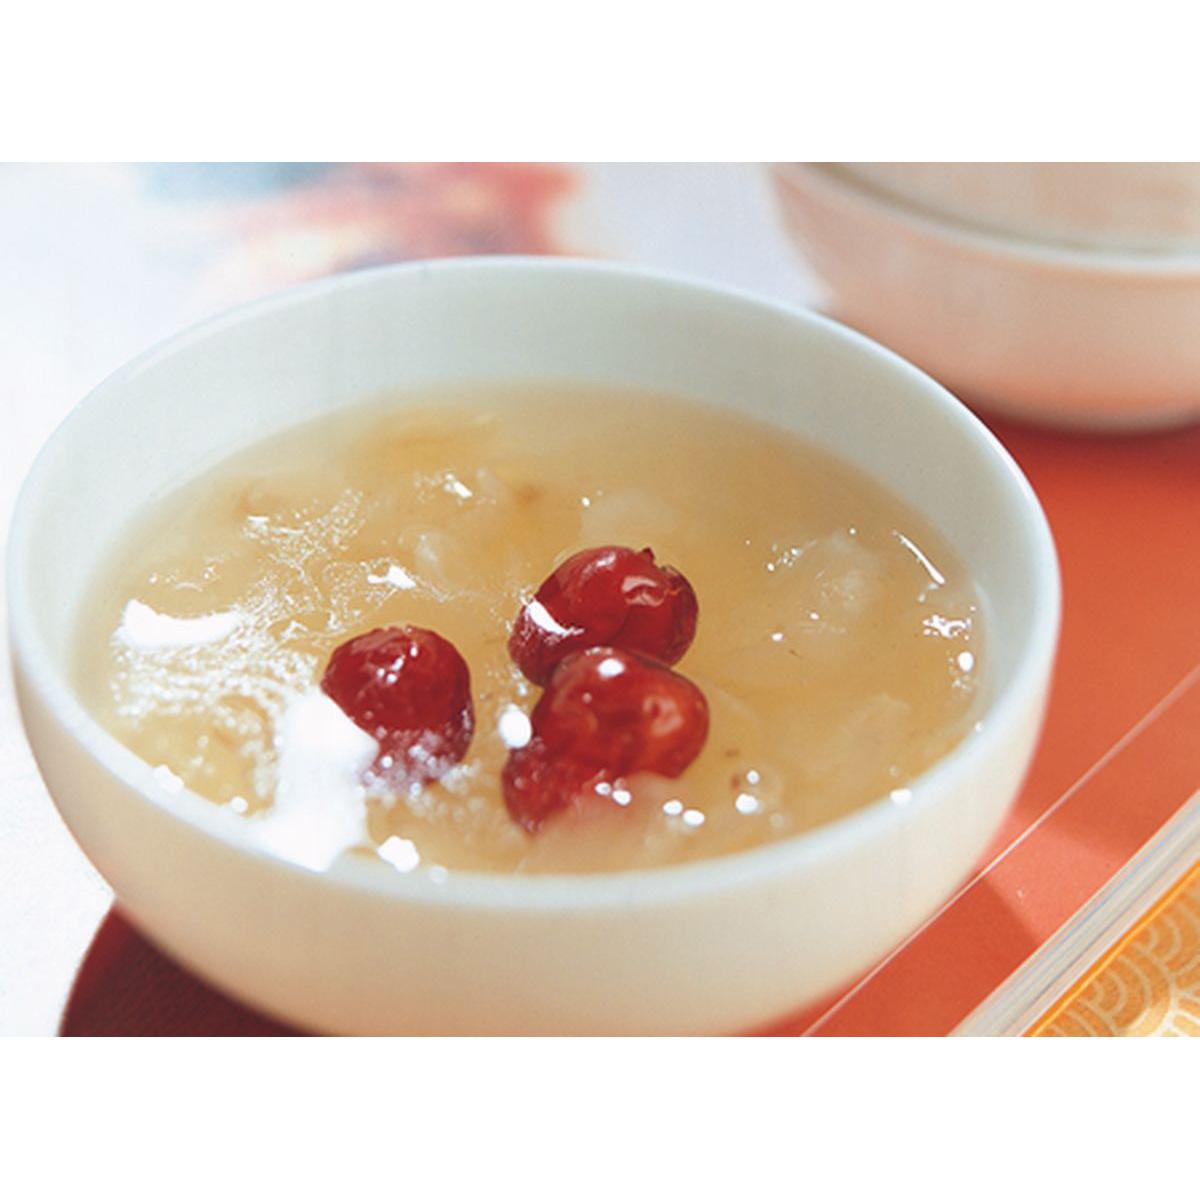 食譜:雪蓮甜湯